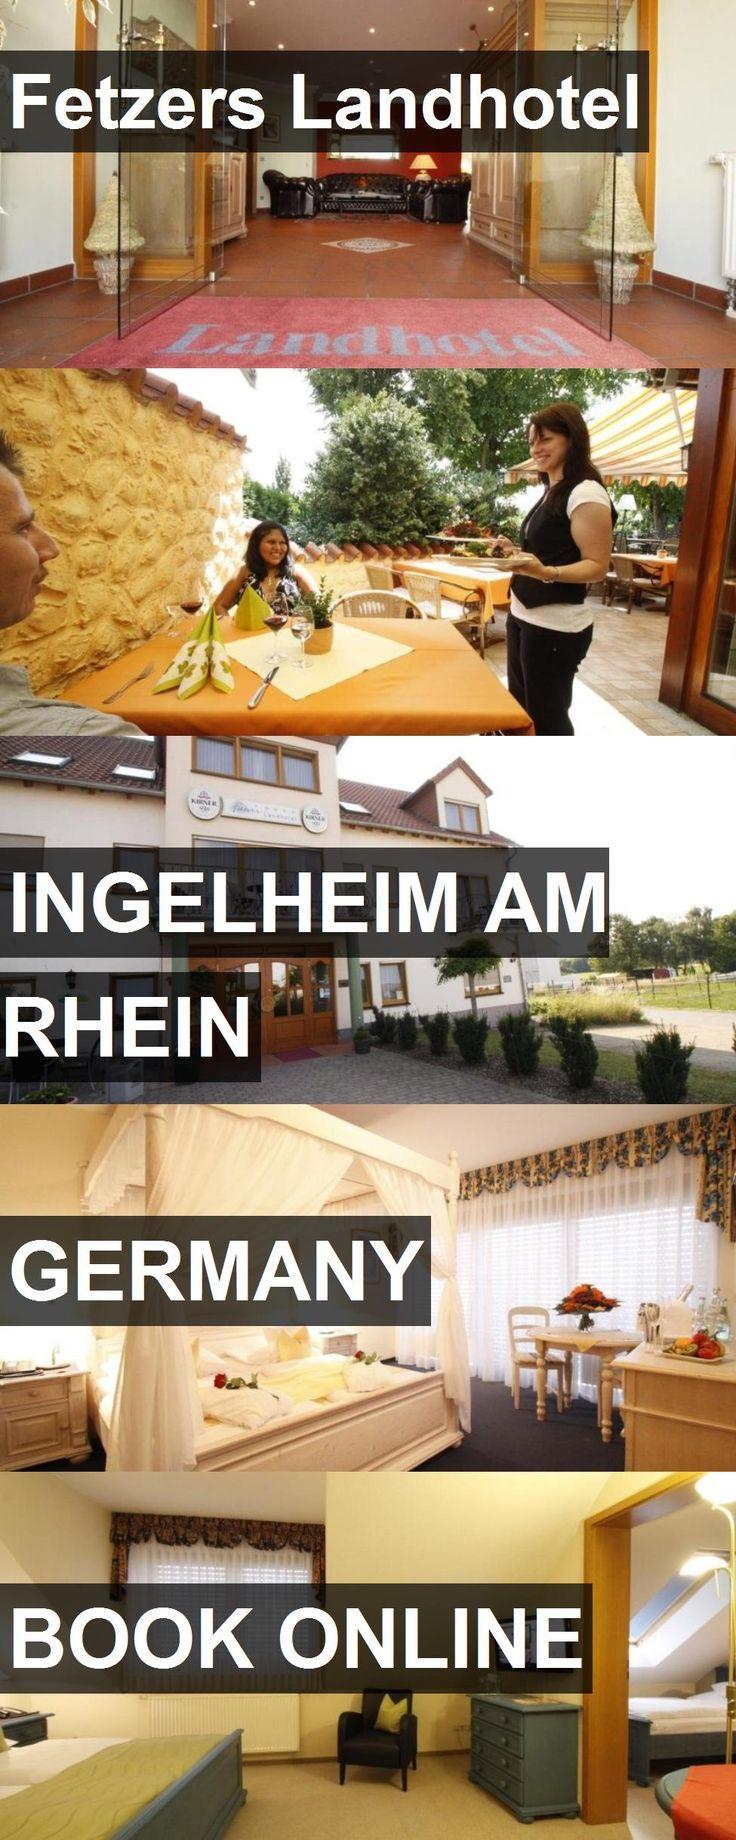 Fetzers Landhotel in Ingelheim am Rhein, Germany. For more information, photos, reviews and best prices please follow the link. #Germany #IngelheimamRhein #travel #vacation #hotel